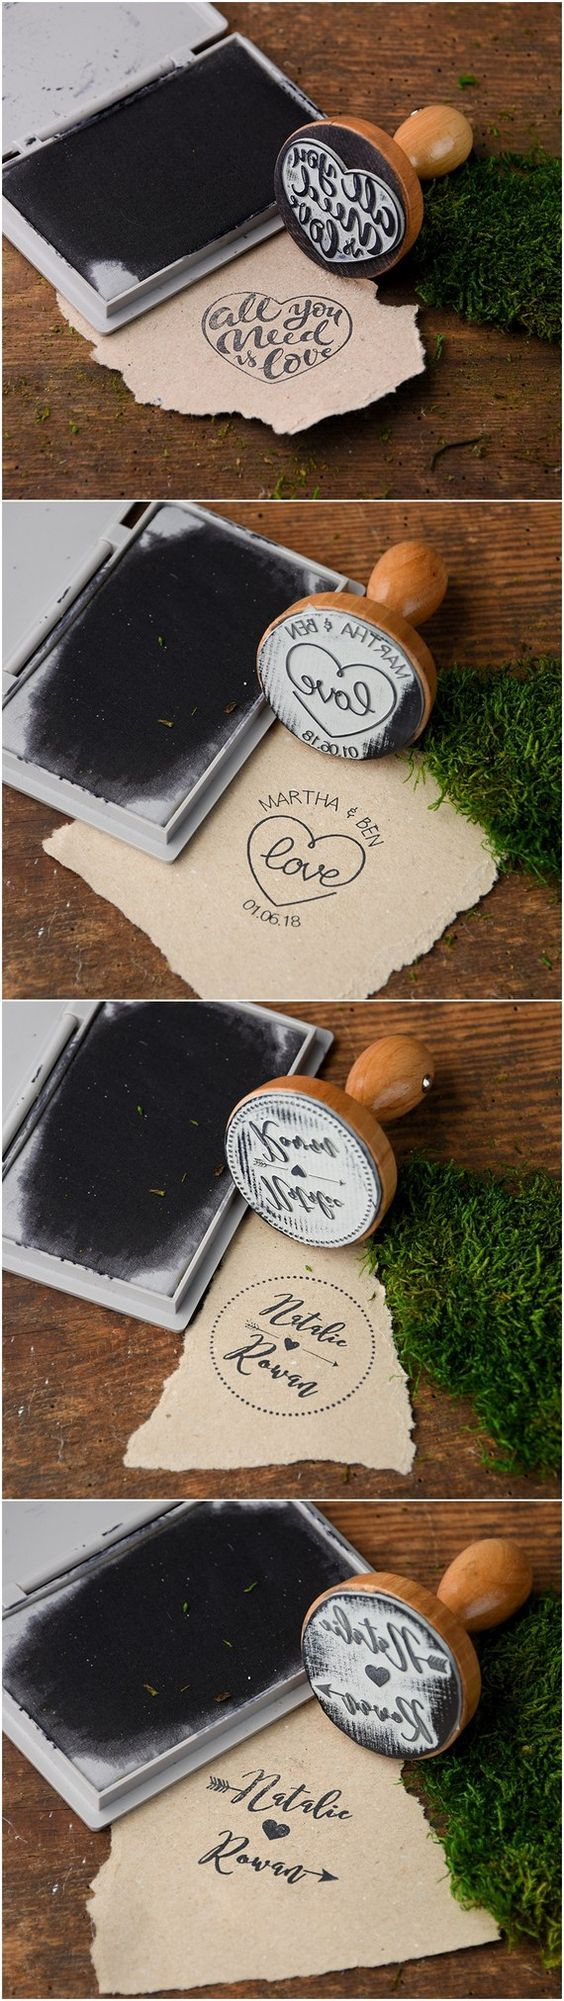 Handmade Wedding Invitations Custom Made for You